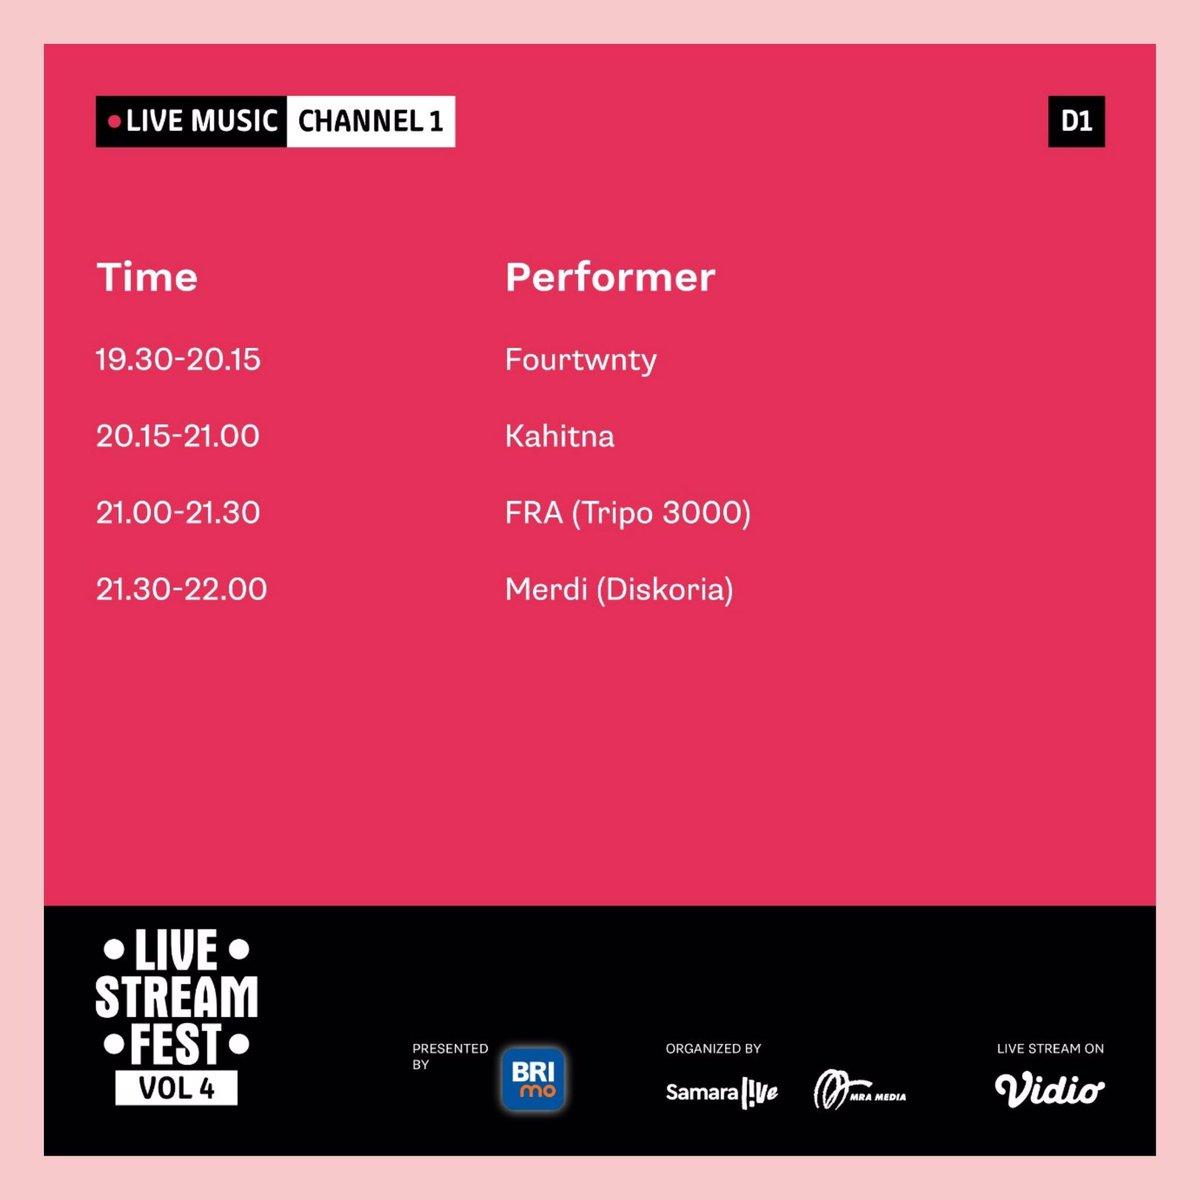 Mau tau siapa aja musisi, content creator, hingga komika yang ada di Live Stream Fest Vol. 4?   Mau tau info lengkapnya? Kunjungi https://t.co/u0VjhcOgWI  #MulaiLagi #LiveStreamFest #LoginKeseruanmu #CovidSafeBUMN https://t.co/PiK8DYG8P6